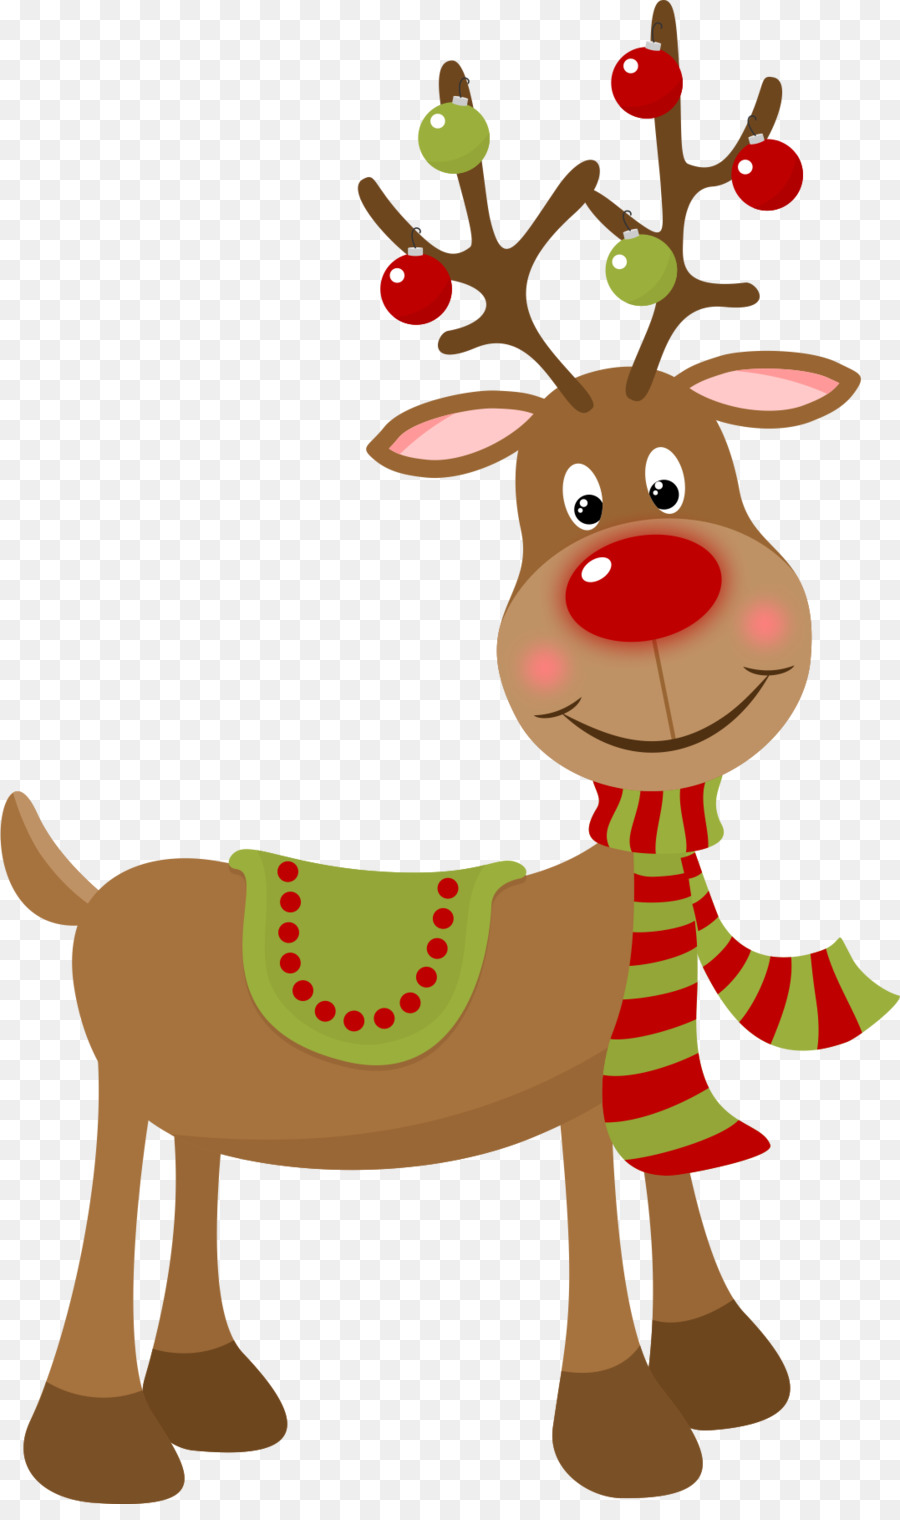 kisspng reindeer rudolph christmas ornament clip art reindeer clipart 5b4b9da6ea4cf4.9813181715316822149597 reindeer rudolph christmas ornament clip art reindeer png download